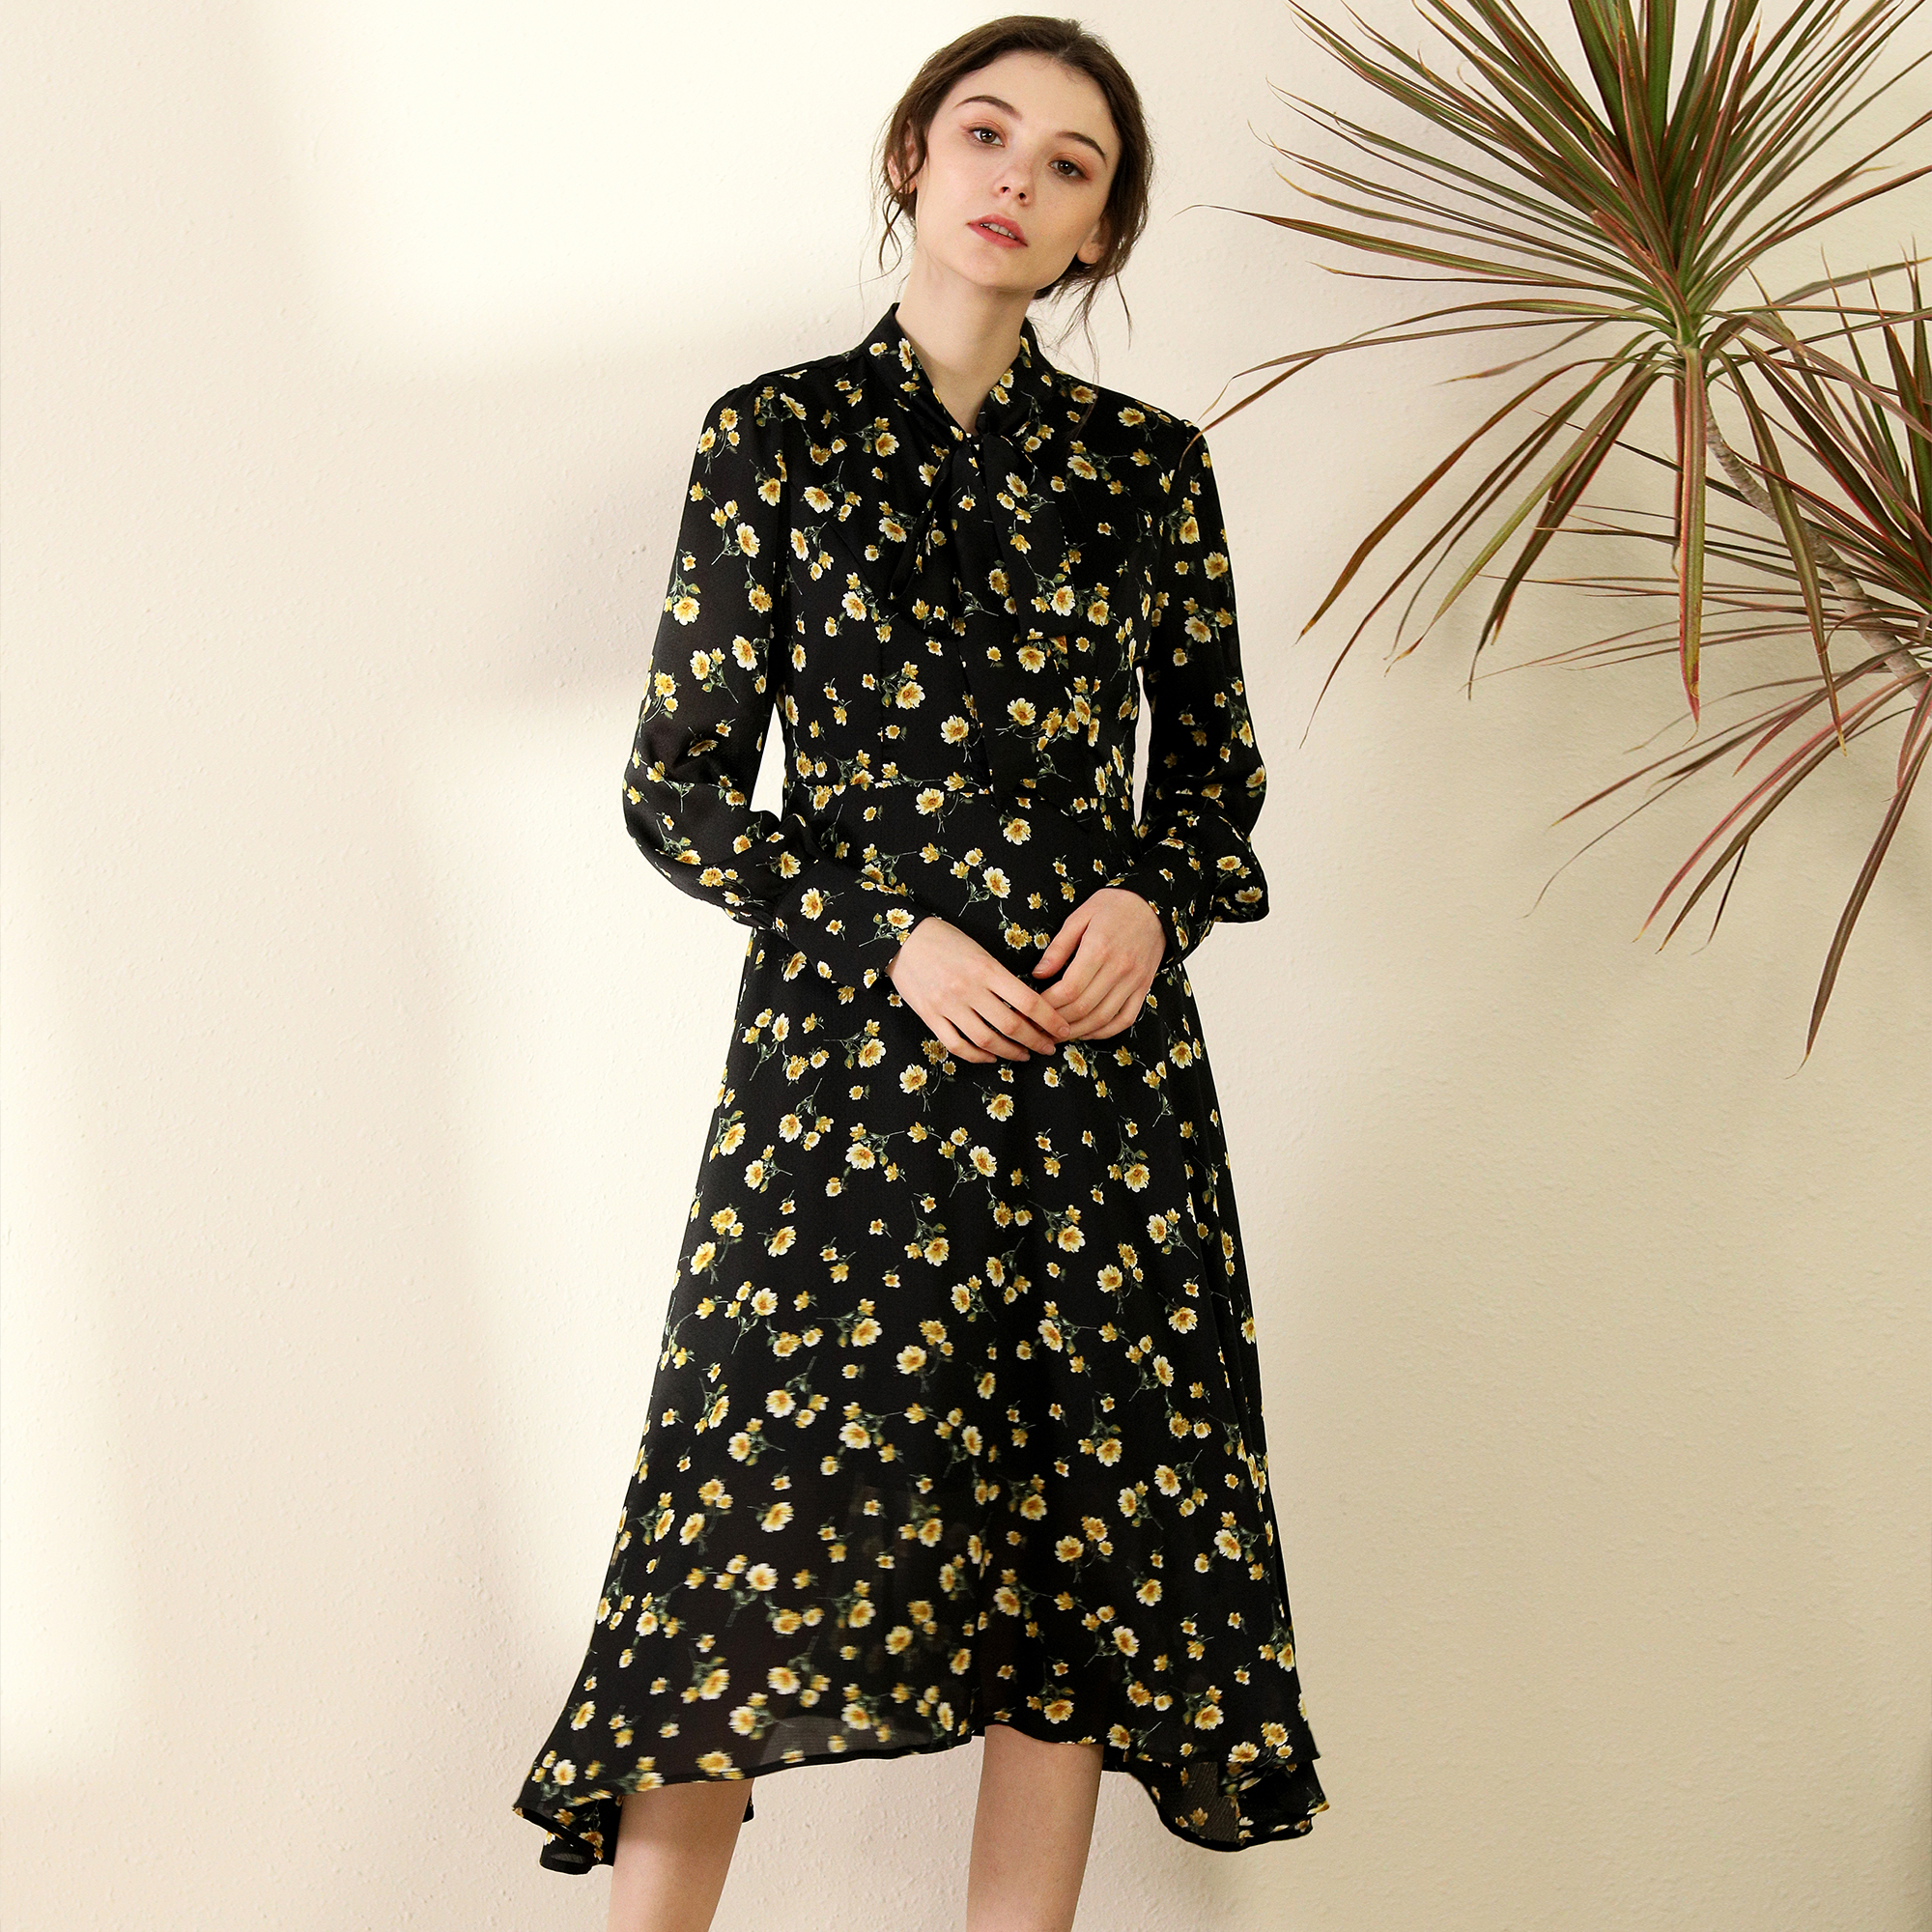 Women Dress Party Dress Casual Dress Maxi Dress Shein Long Dress Vintage  Dress Robe Sukienki Knit Dress Black Dress